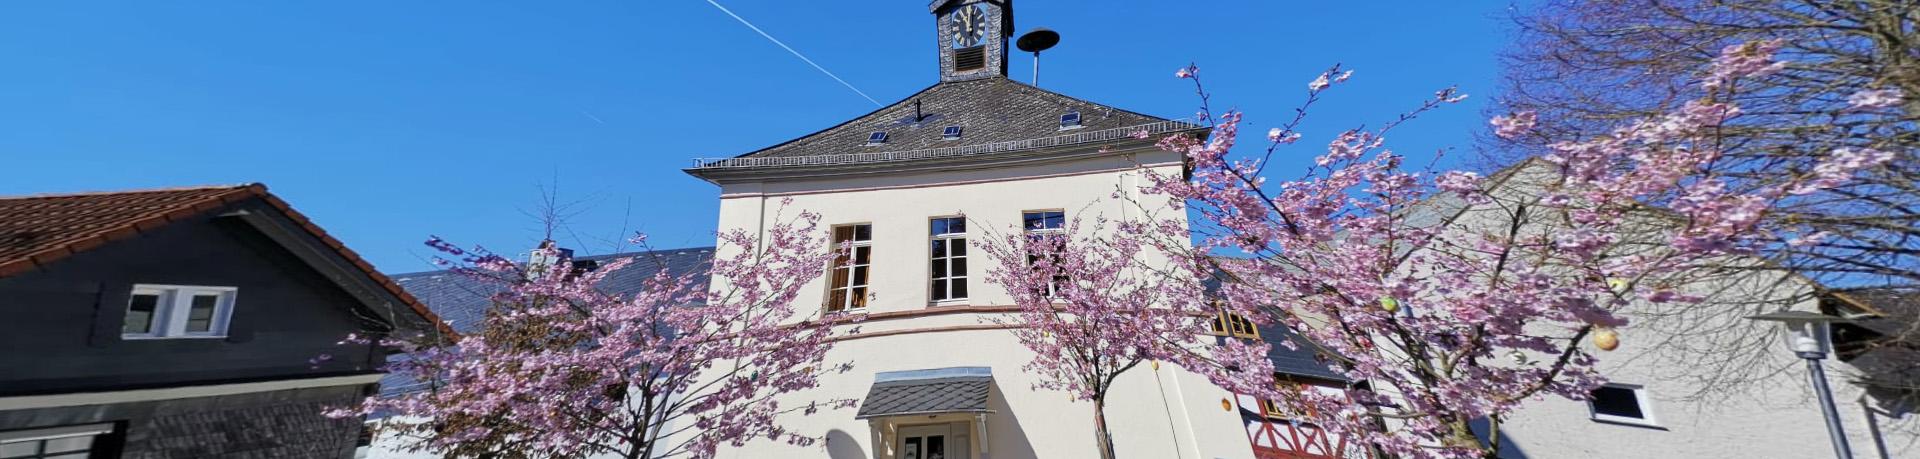 Frühling in Wingsbach